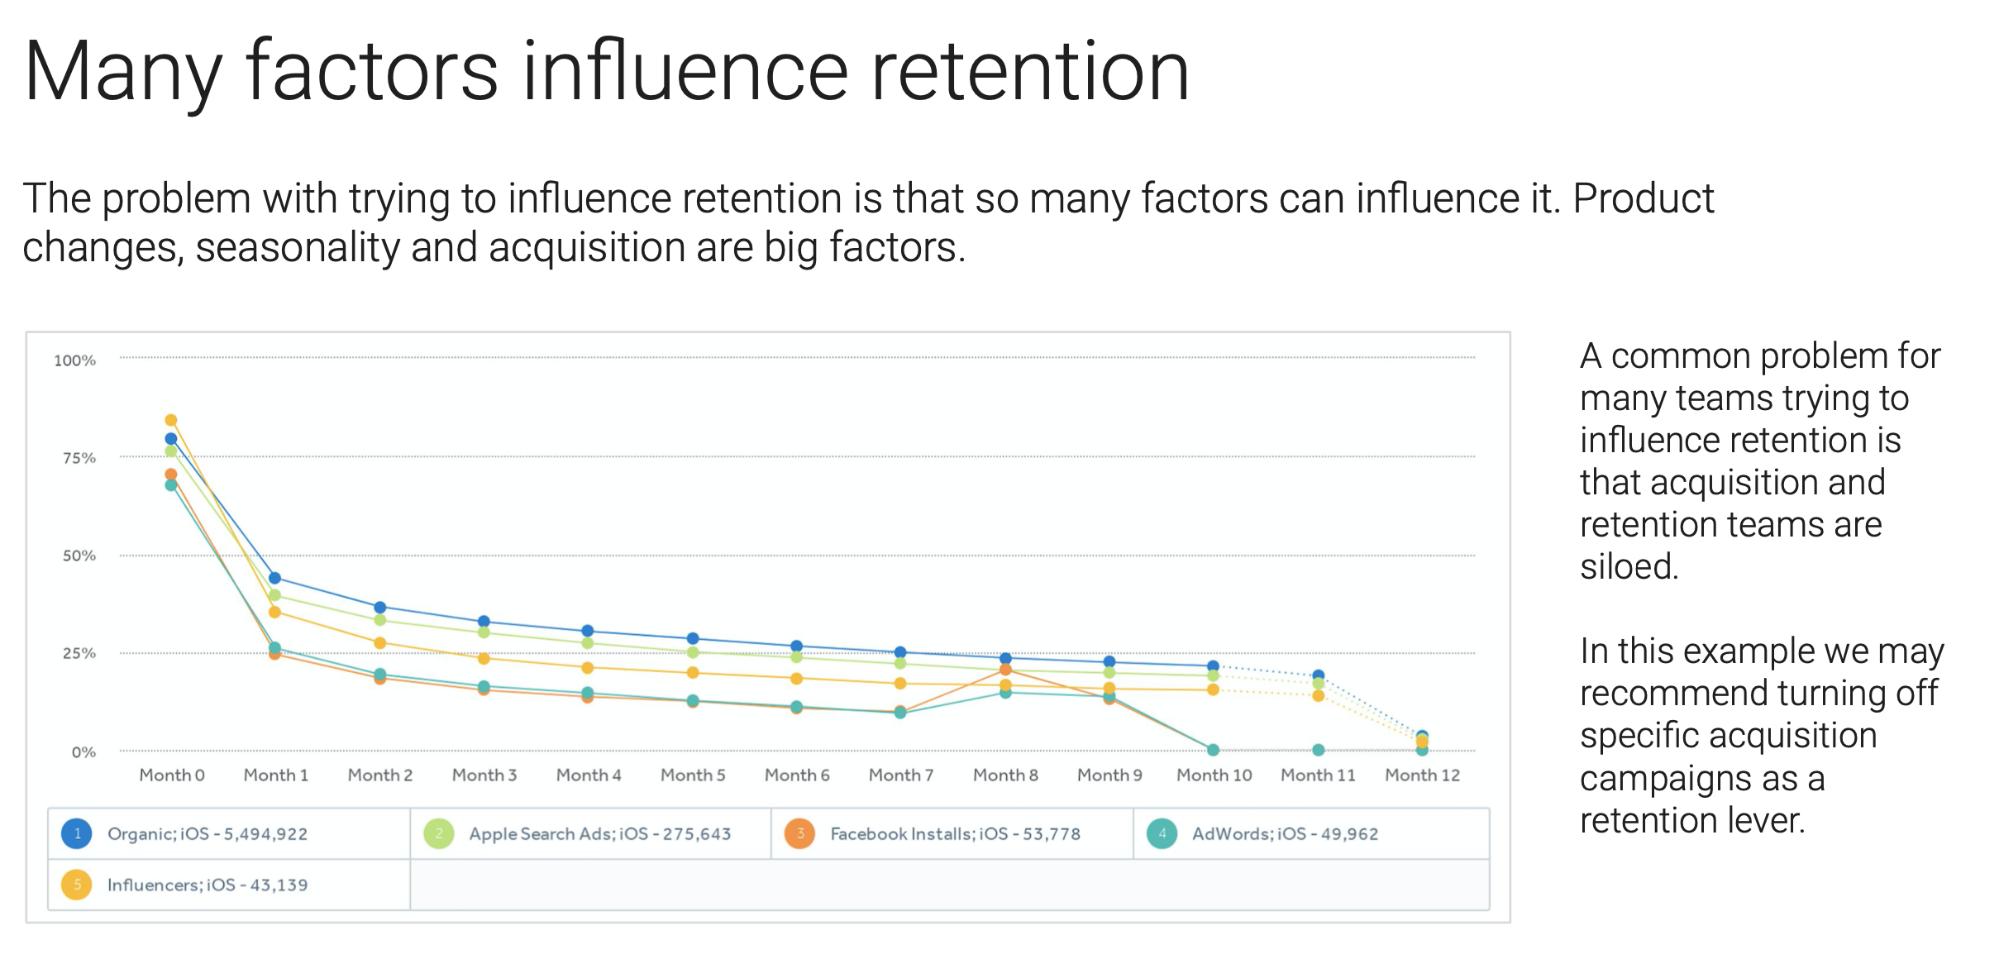 Factors that influence retention